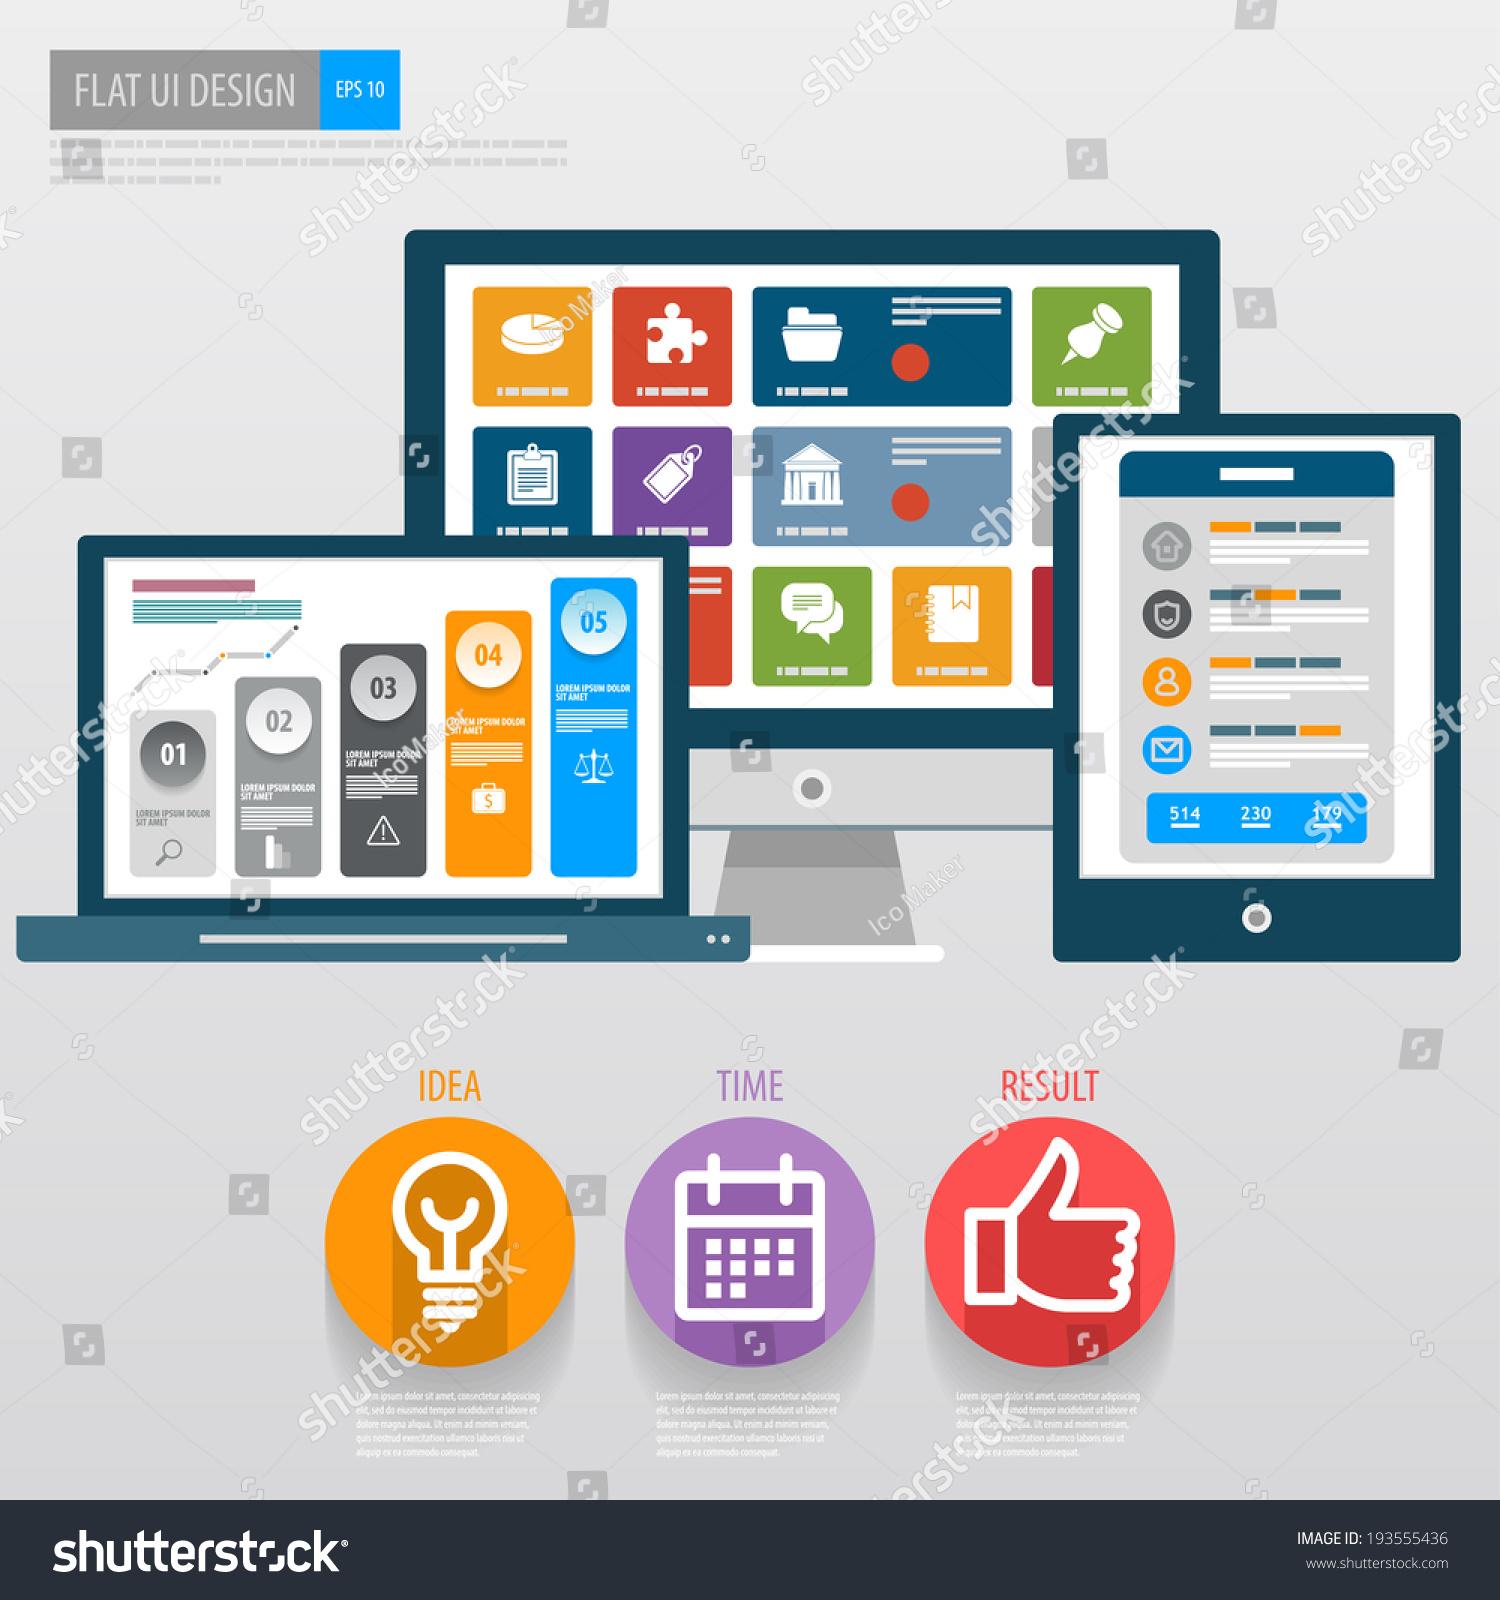 Flat Ui Design Responsive Web Template Stock Vector Royalty Free